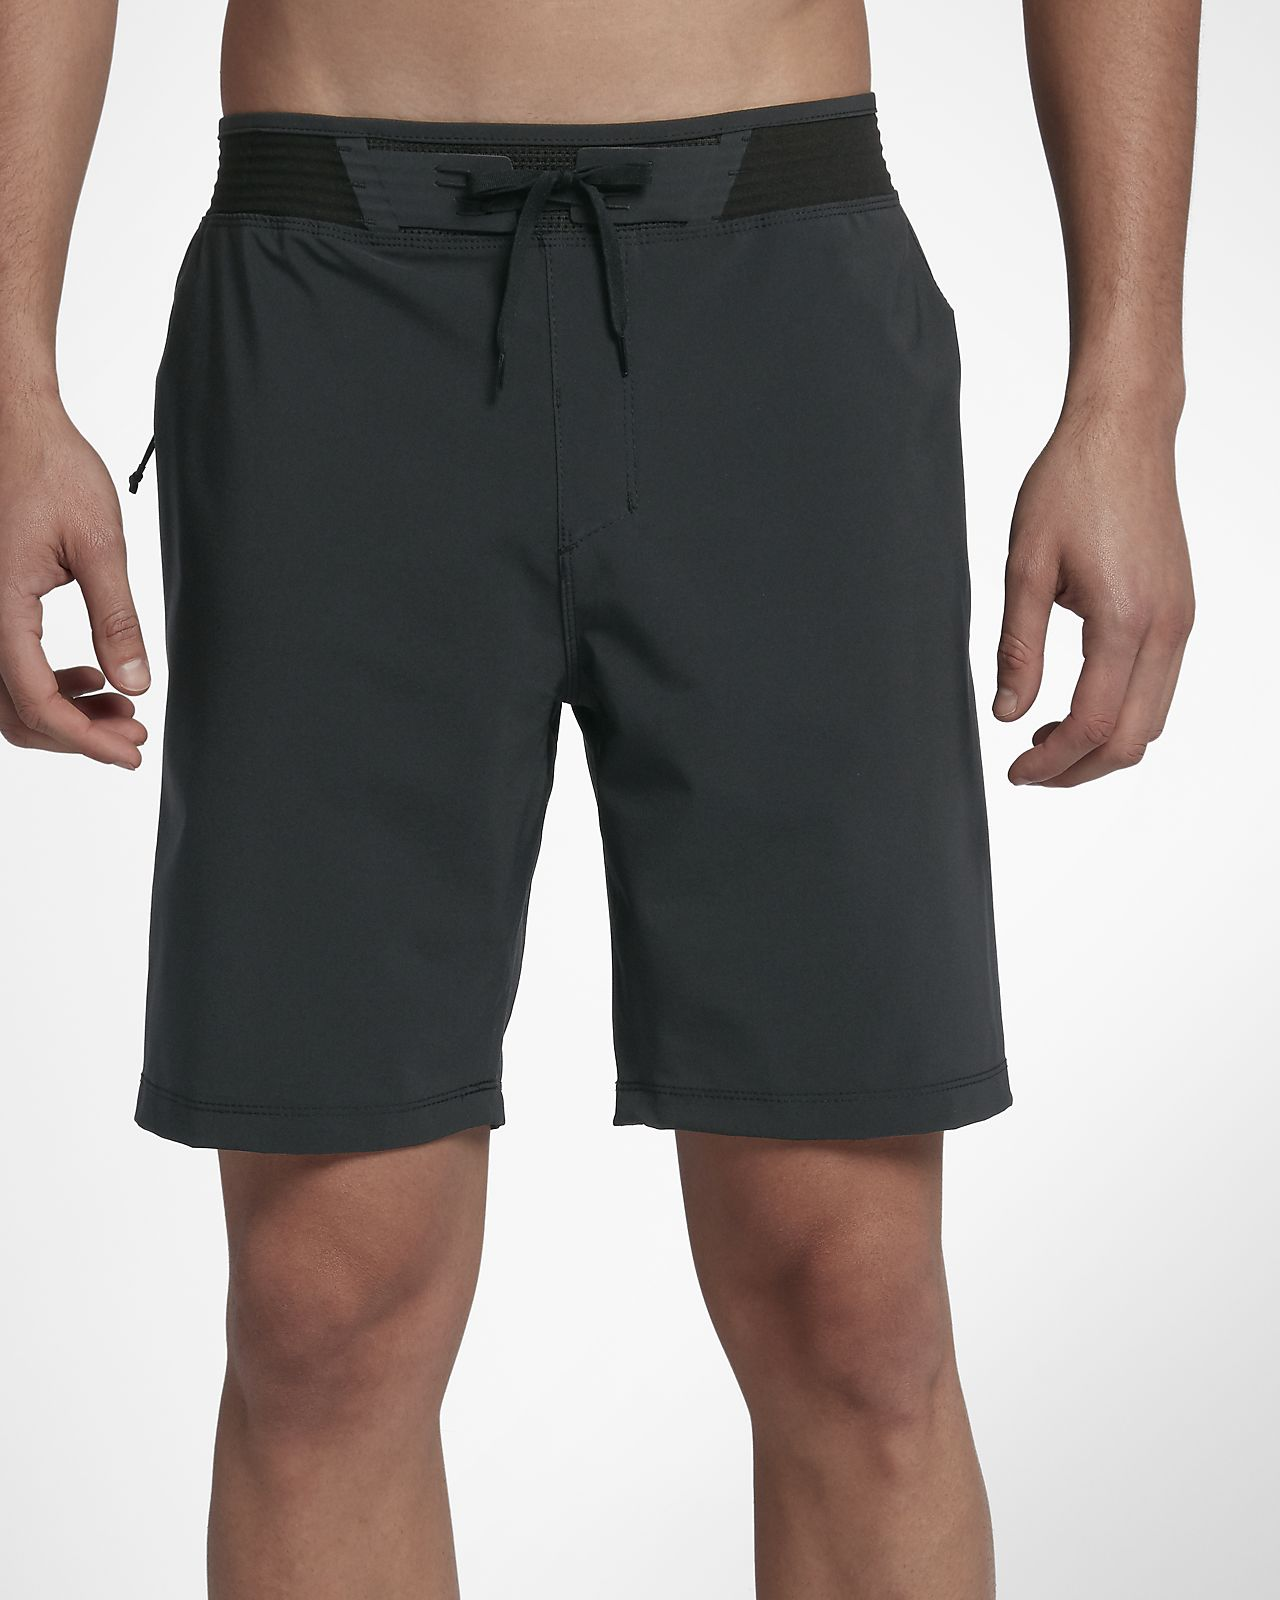 Hurley Phantom Hyperweave Herren-Boardshorts (ca. 45,5 cm)